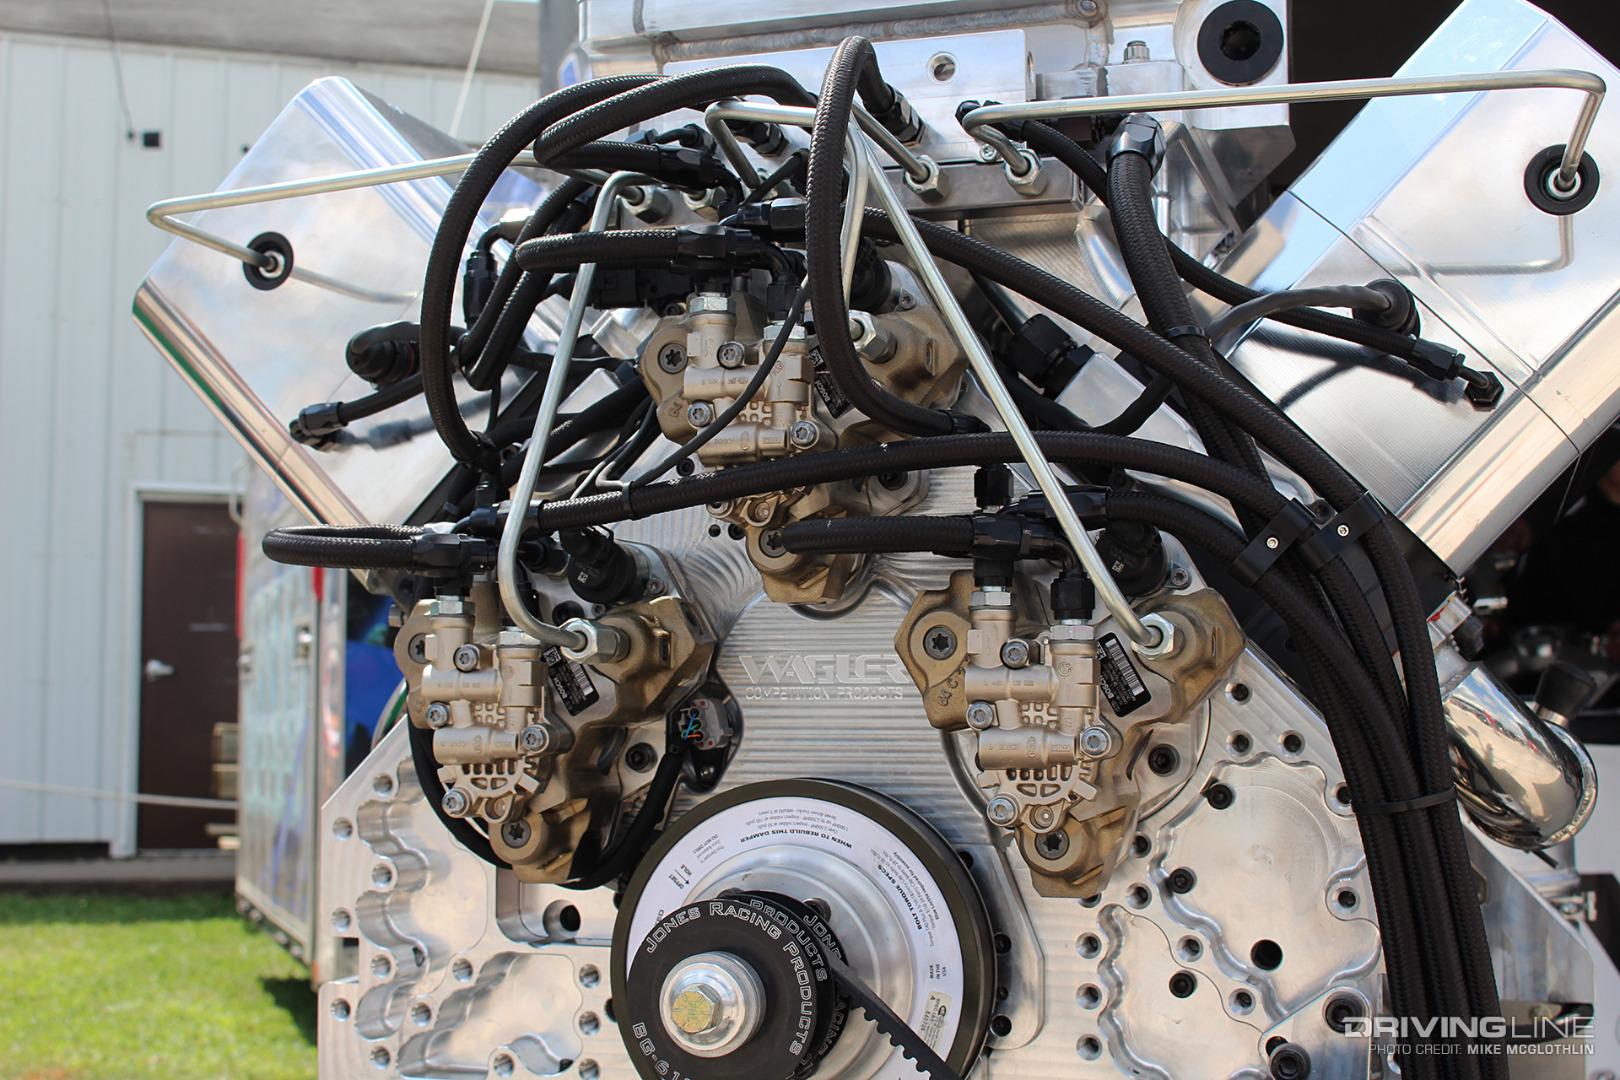 Under Pressure: Extreme Injection Pumps | DrivingLine